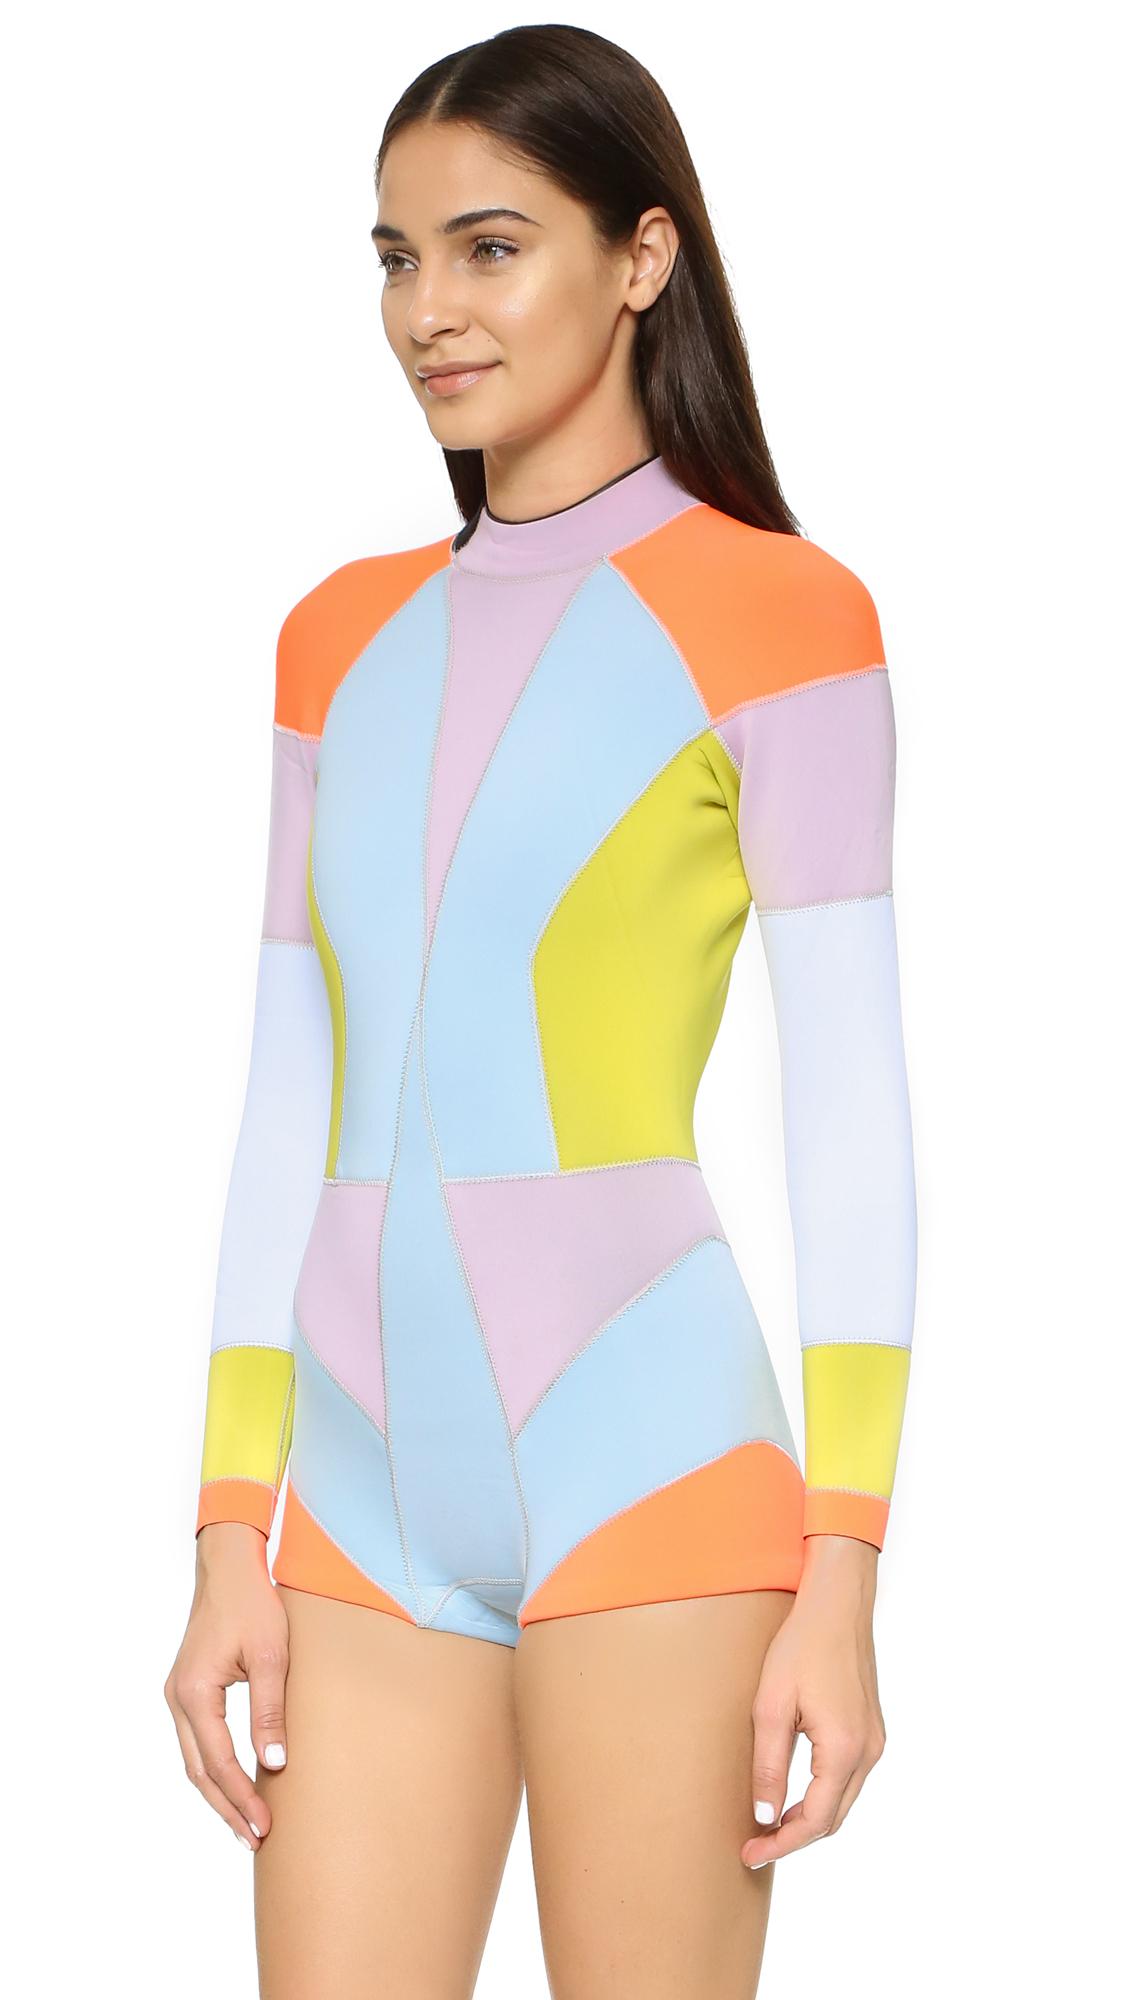 7b5135130d Cynthia Rowley Colorblock Wetsuit - Lyst